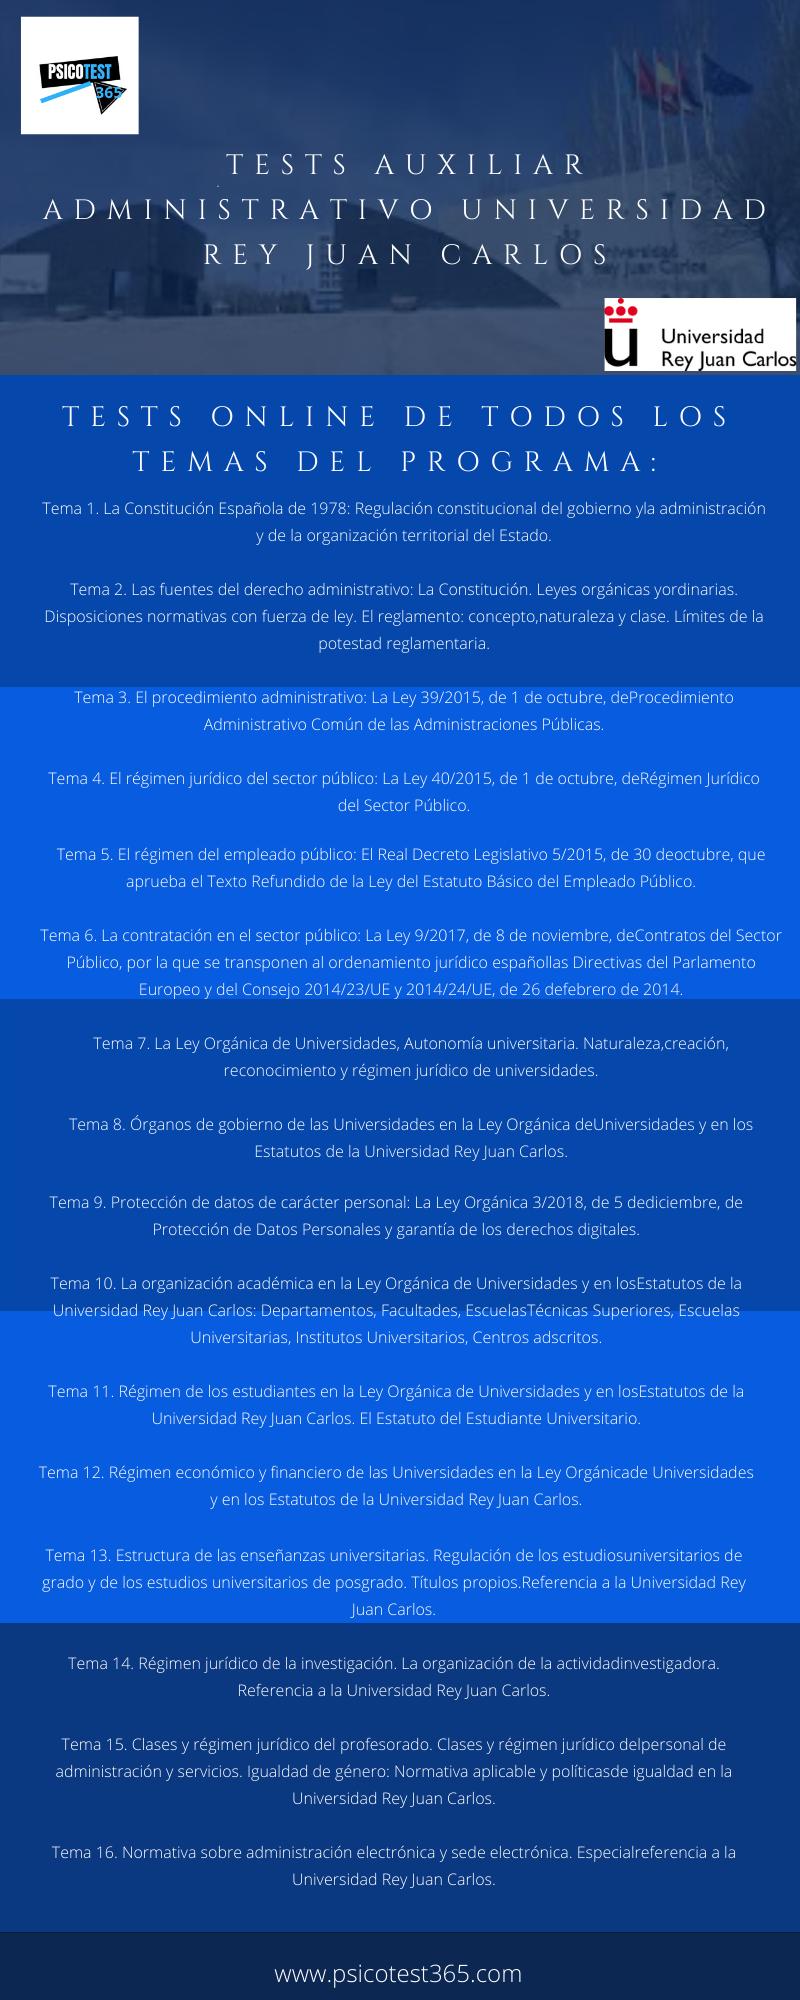 infografía auxiliar administrativo URJC